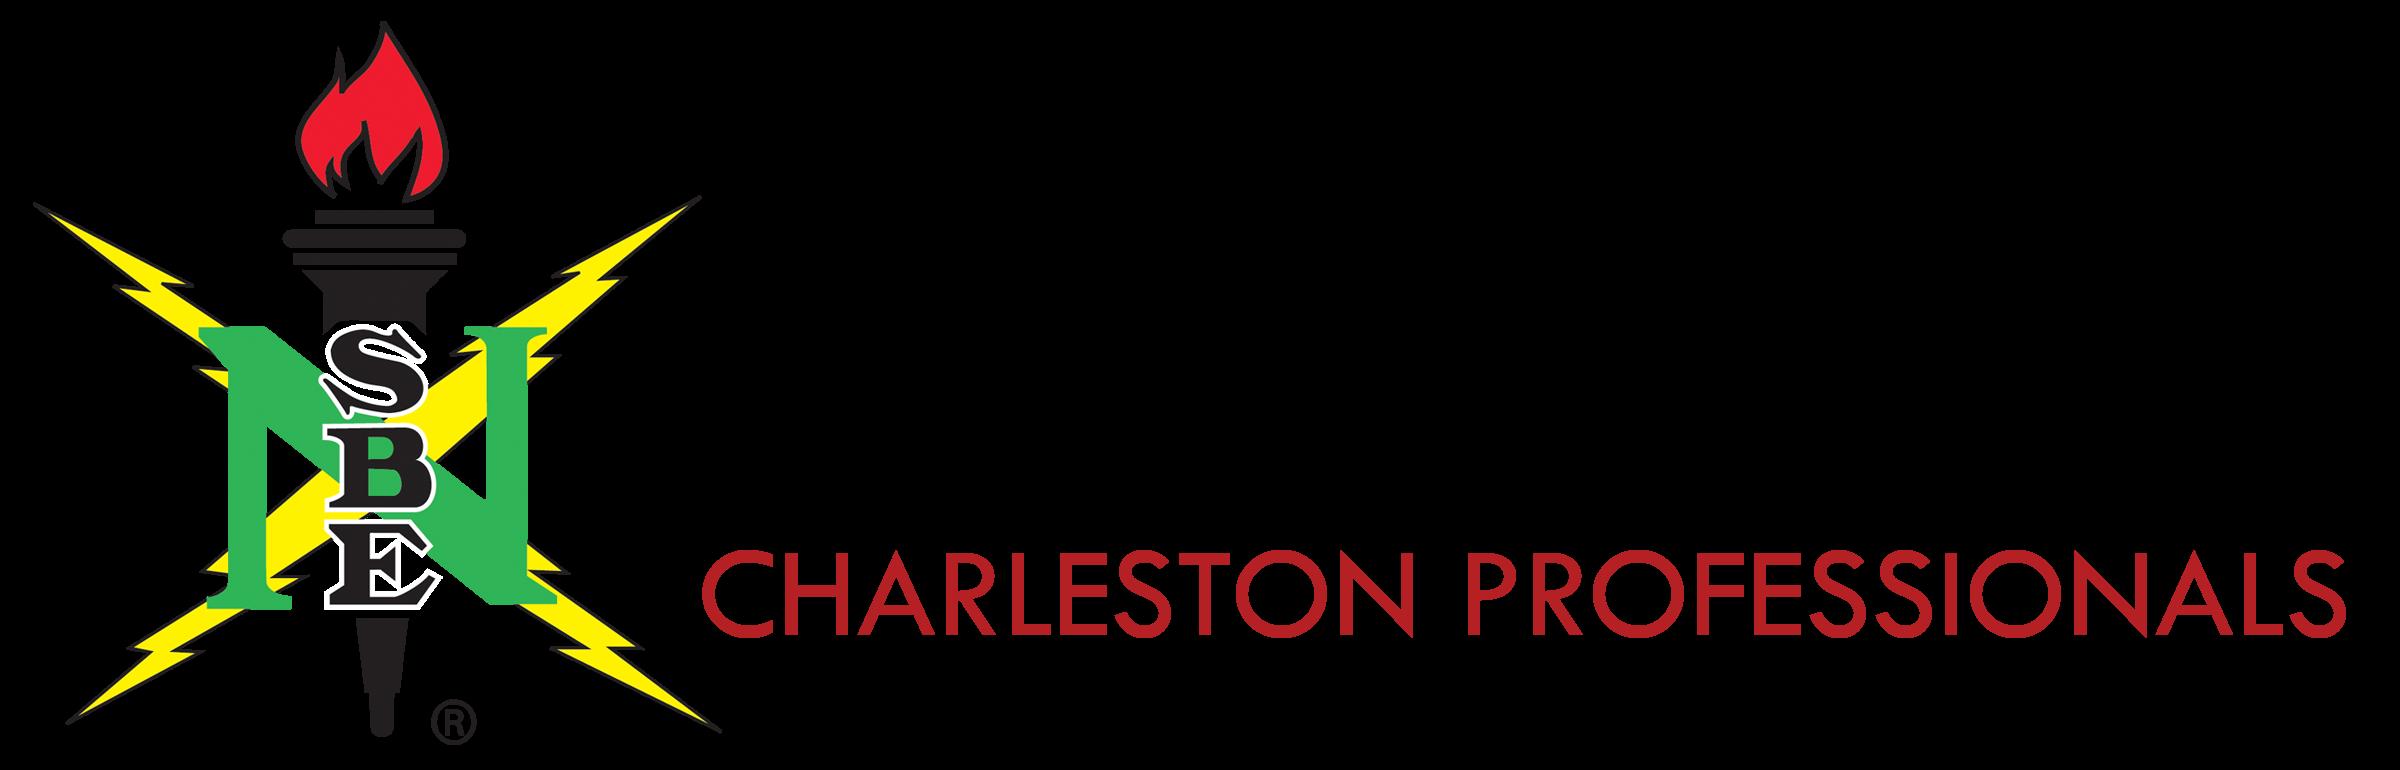 NSBE Charleston